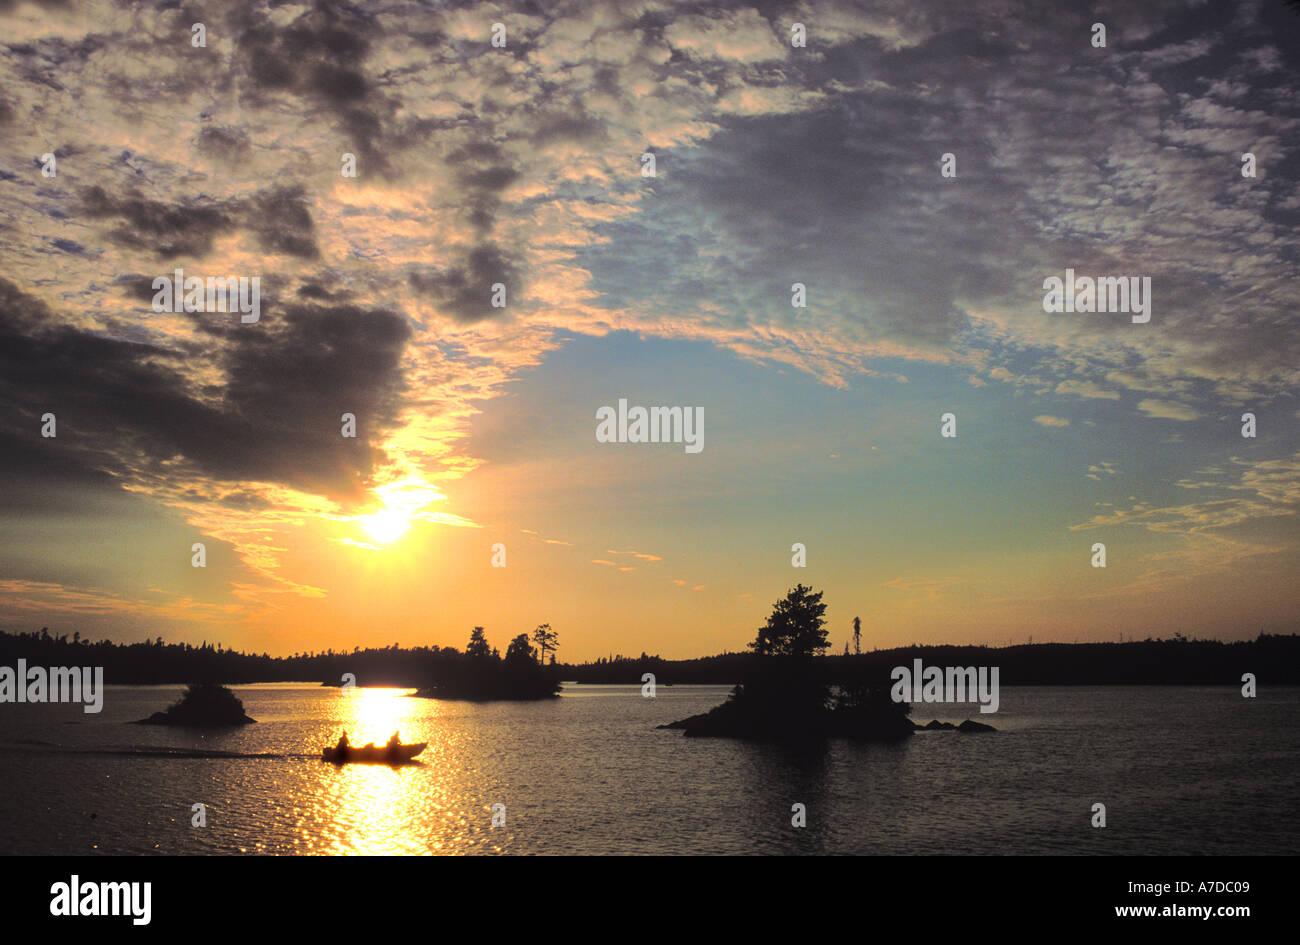 Fishing boat at sunset on Seagull lake Boundary Waters Canoe Area Wilderness Minnesota - Stock Image